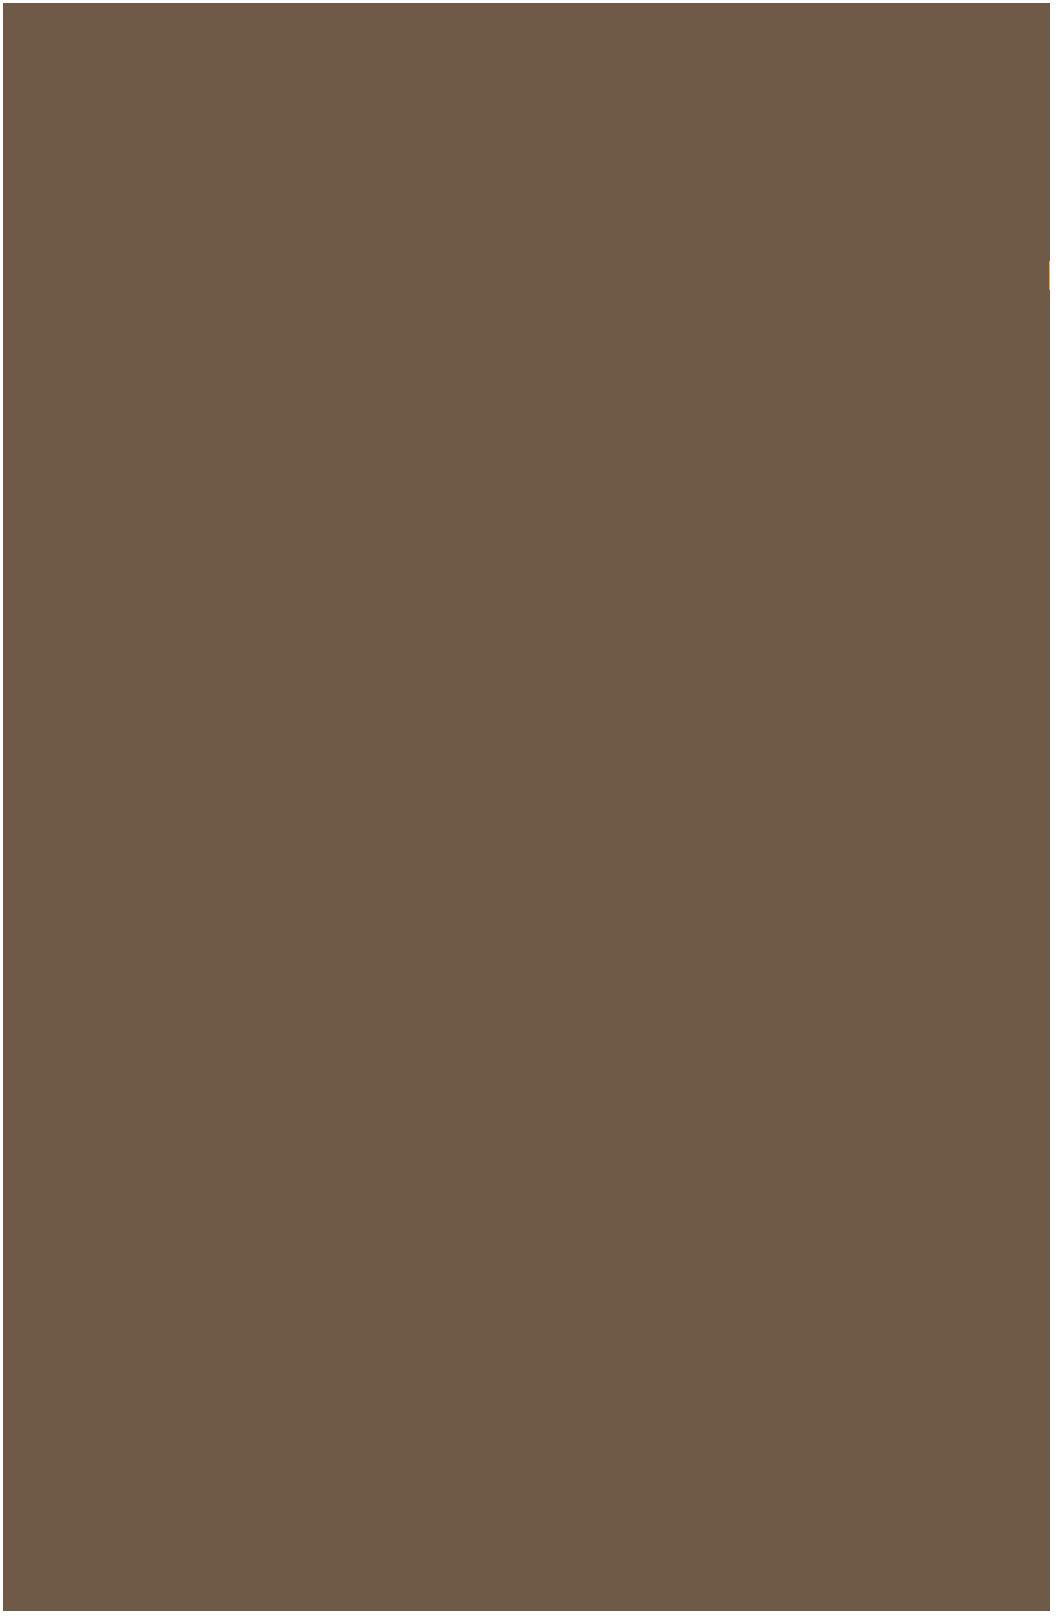 Karton kolor A1 brązowy Lux Interdruk 119